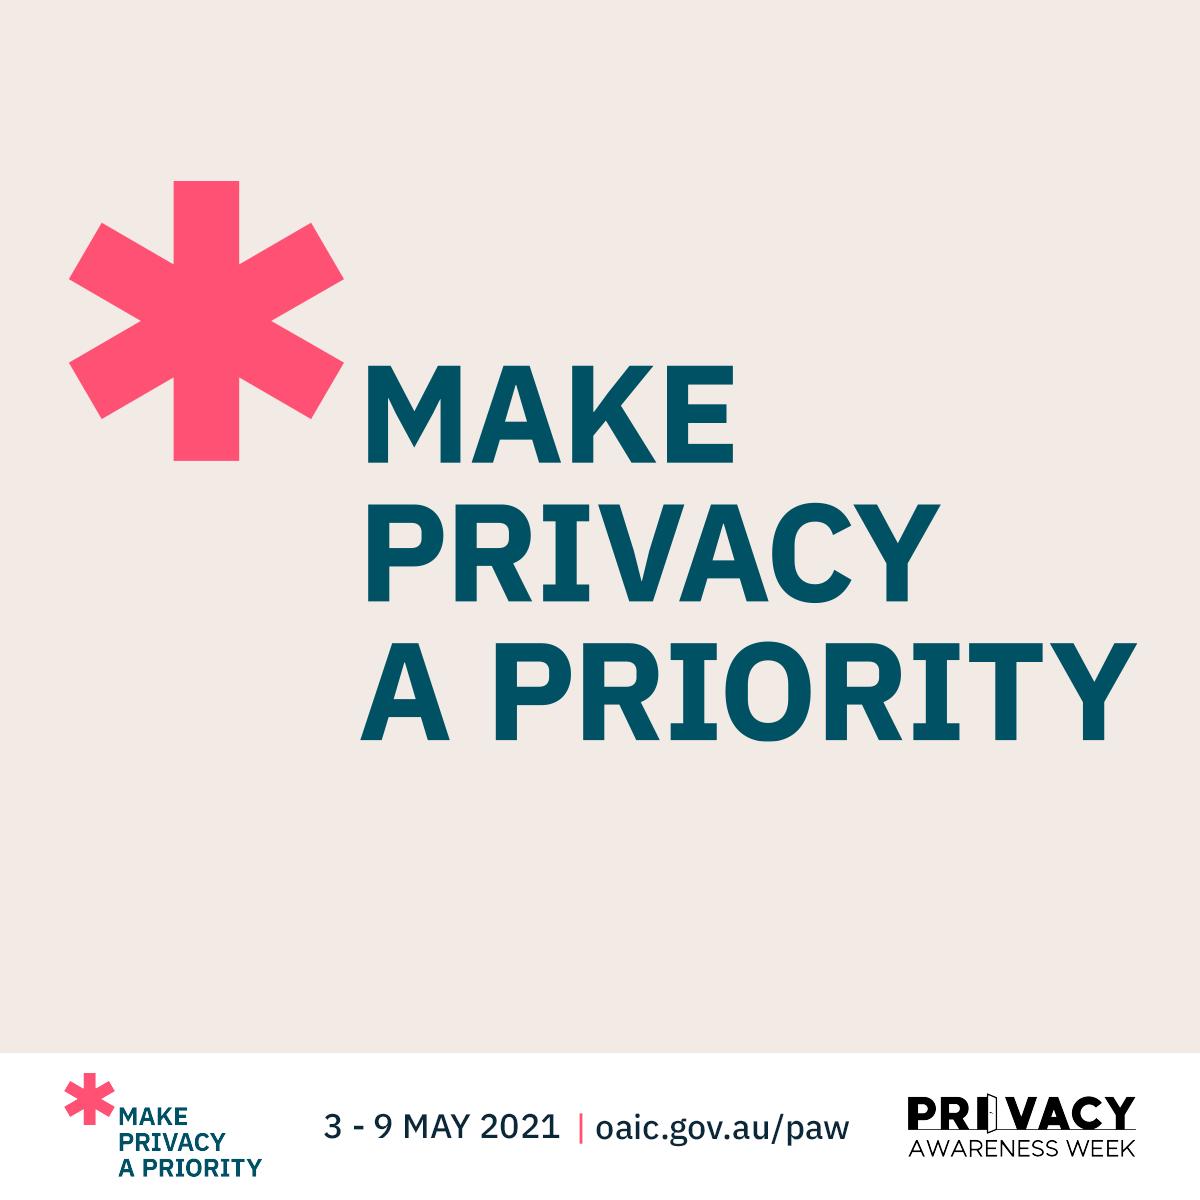 Privacy Awareness Week, May 3-9 in Australia